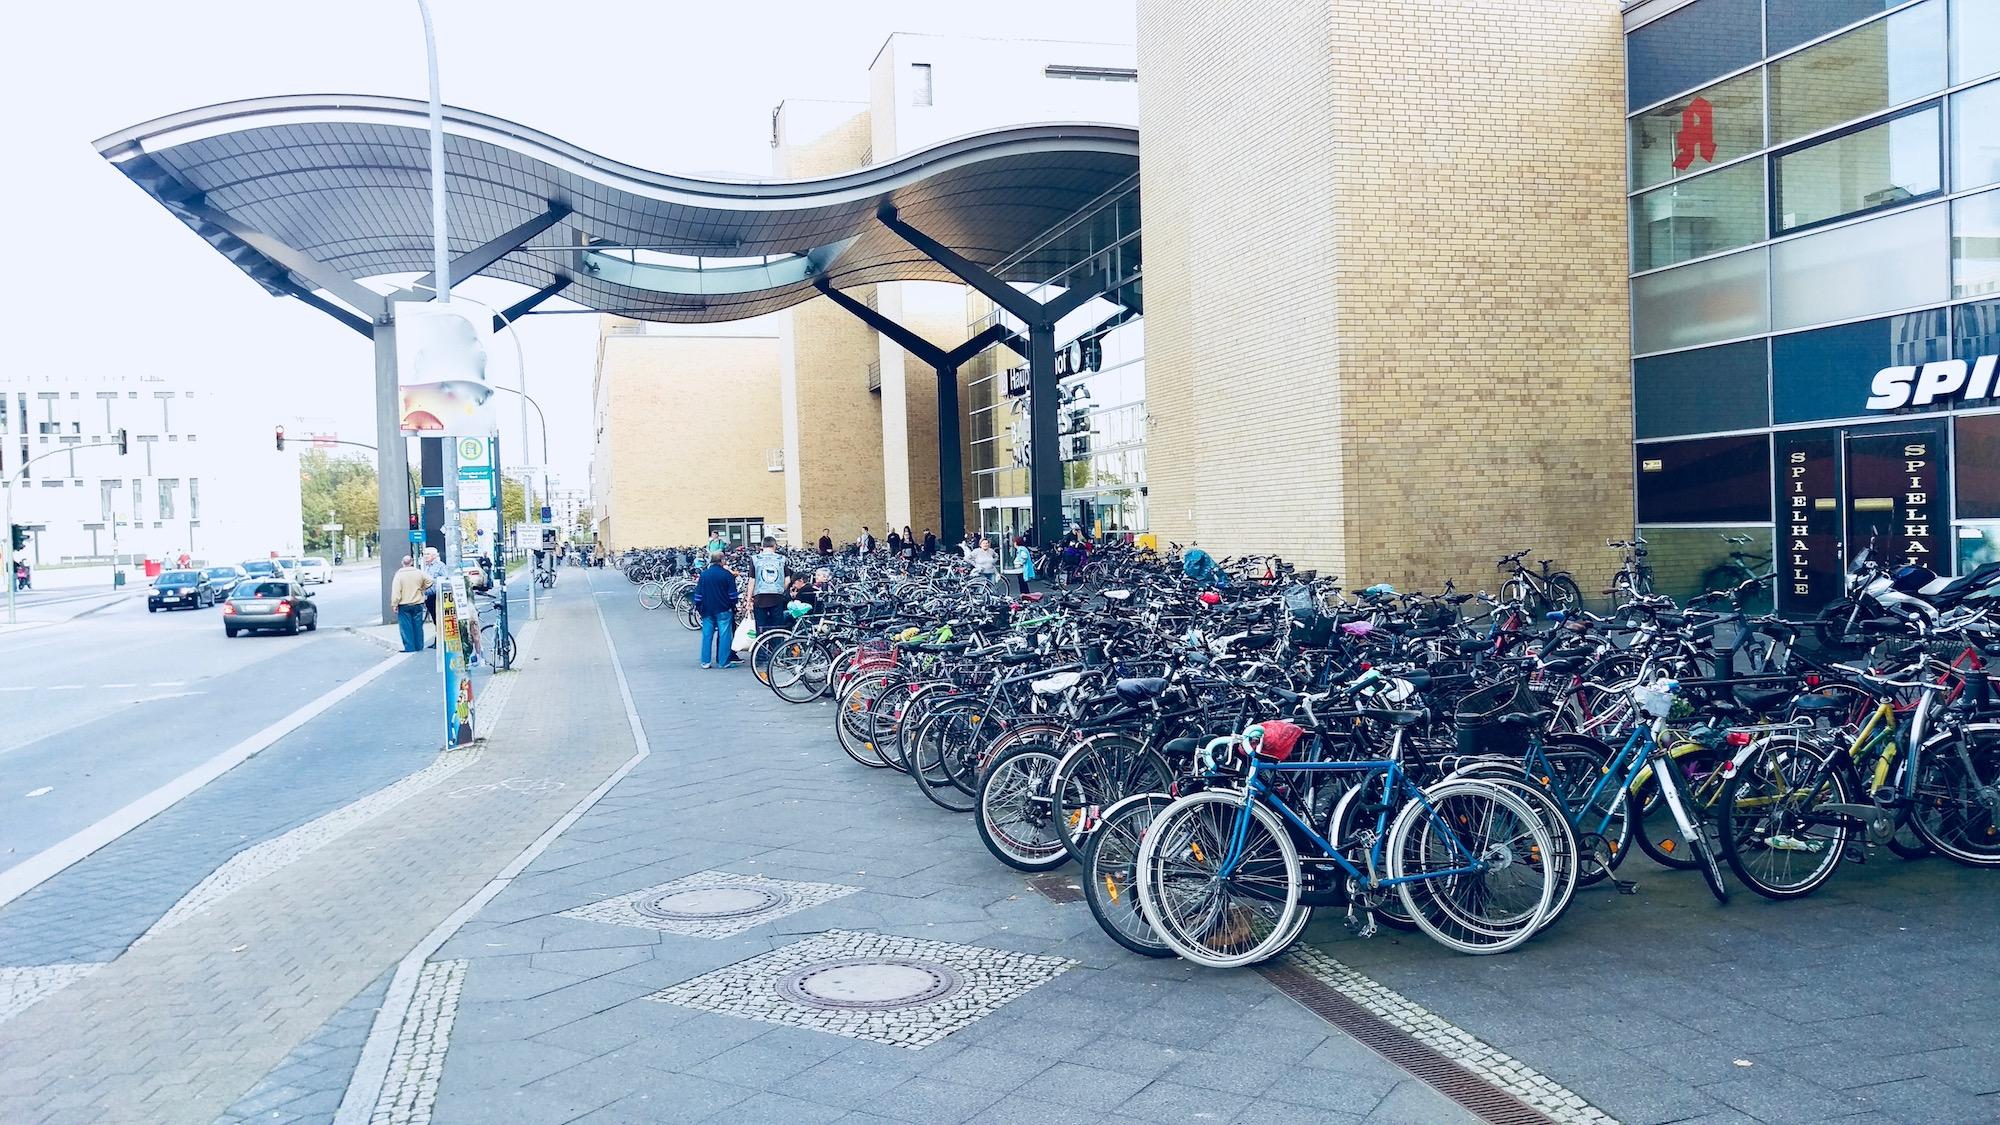 Potsdam Hauptbahnhof is the main station in the city of Potsdam, Germany.